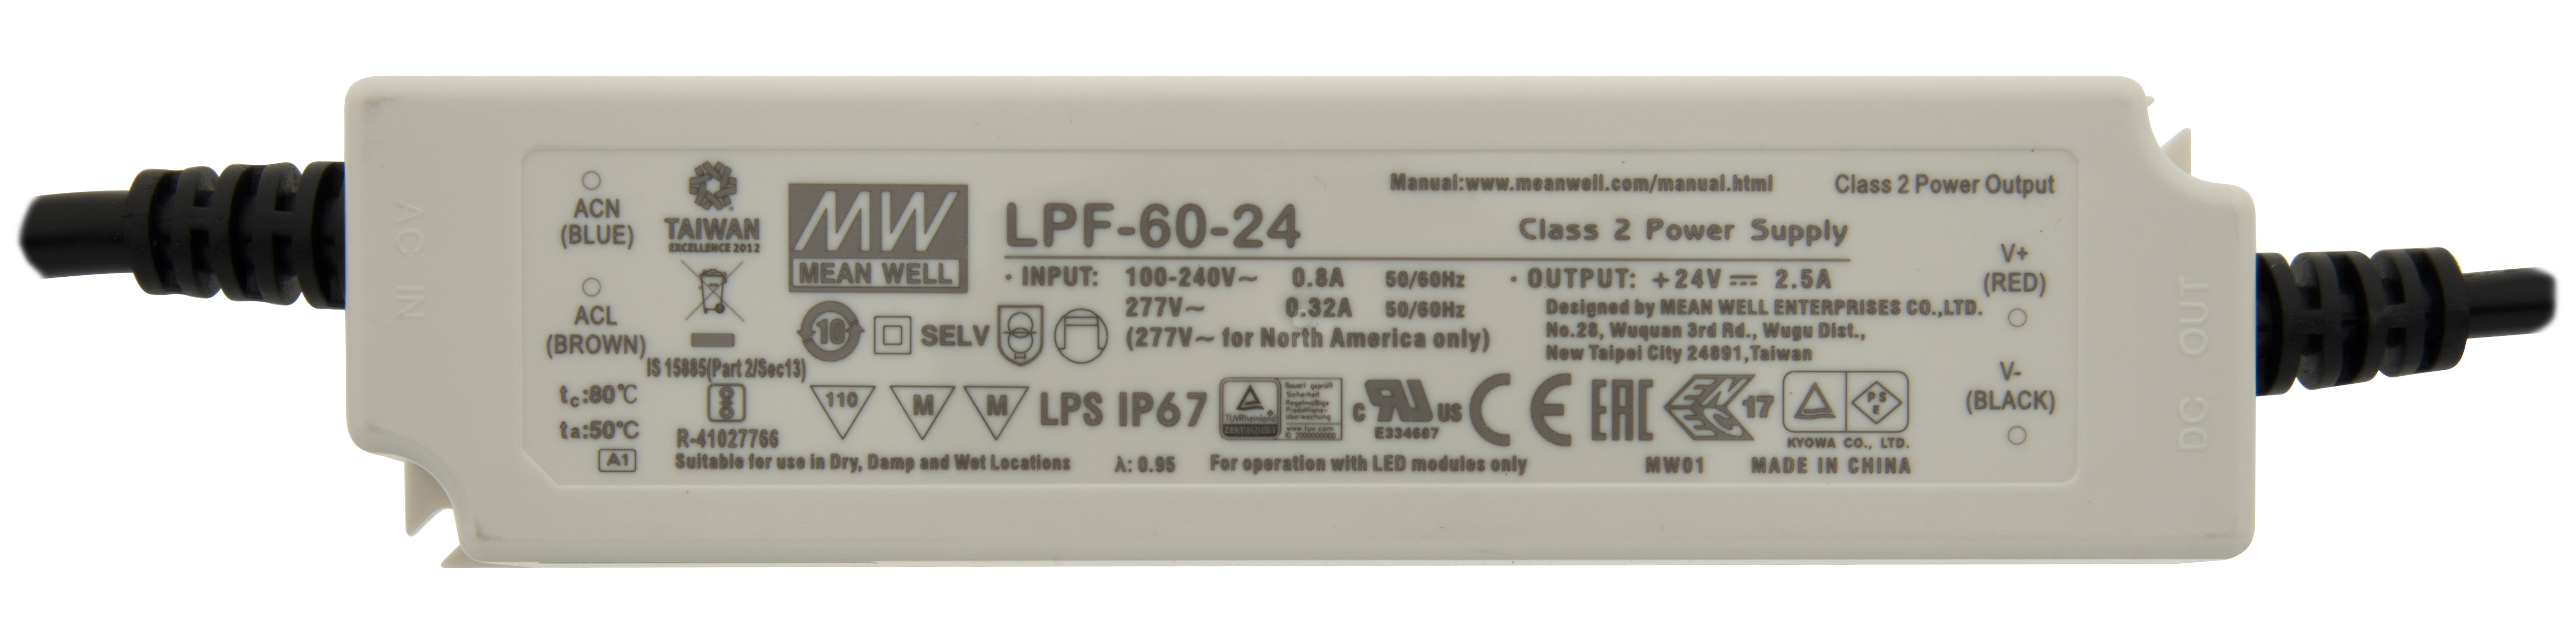 1 Stk LED Netzteil LPF 40W/24V, MM, IP67 LINT024040